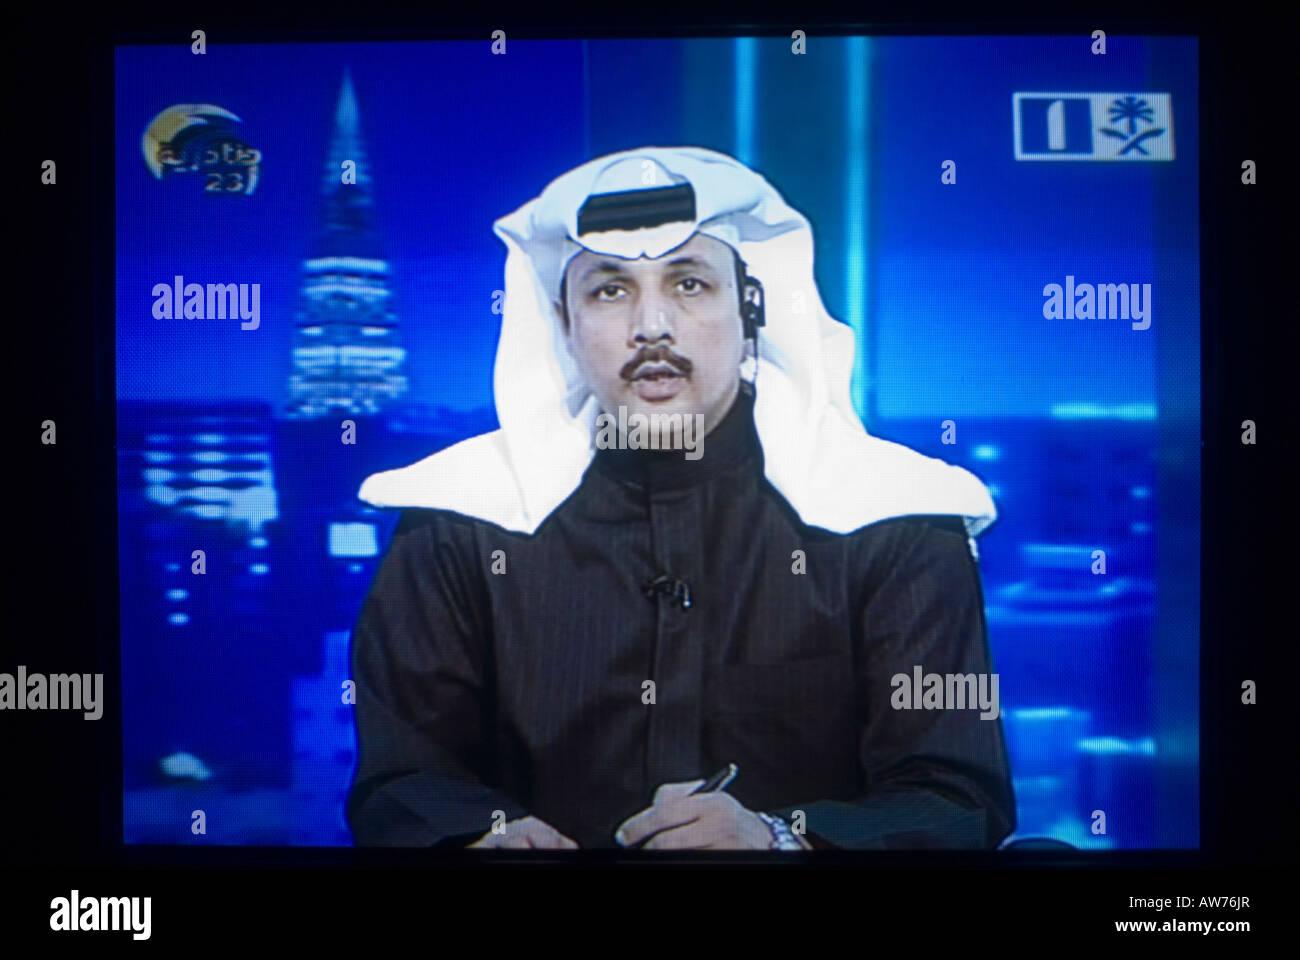 La roja me la trae floja (aqui se viene a odiar)          Te atiende un navarro. - Página 14 Tv-screen-shot-of-a-saudi-newscaster-wearing-a-traditional-keffiyeh-AW76JR